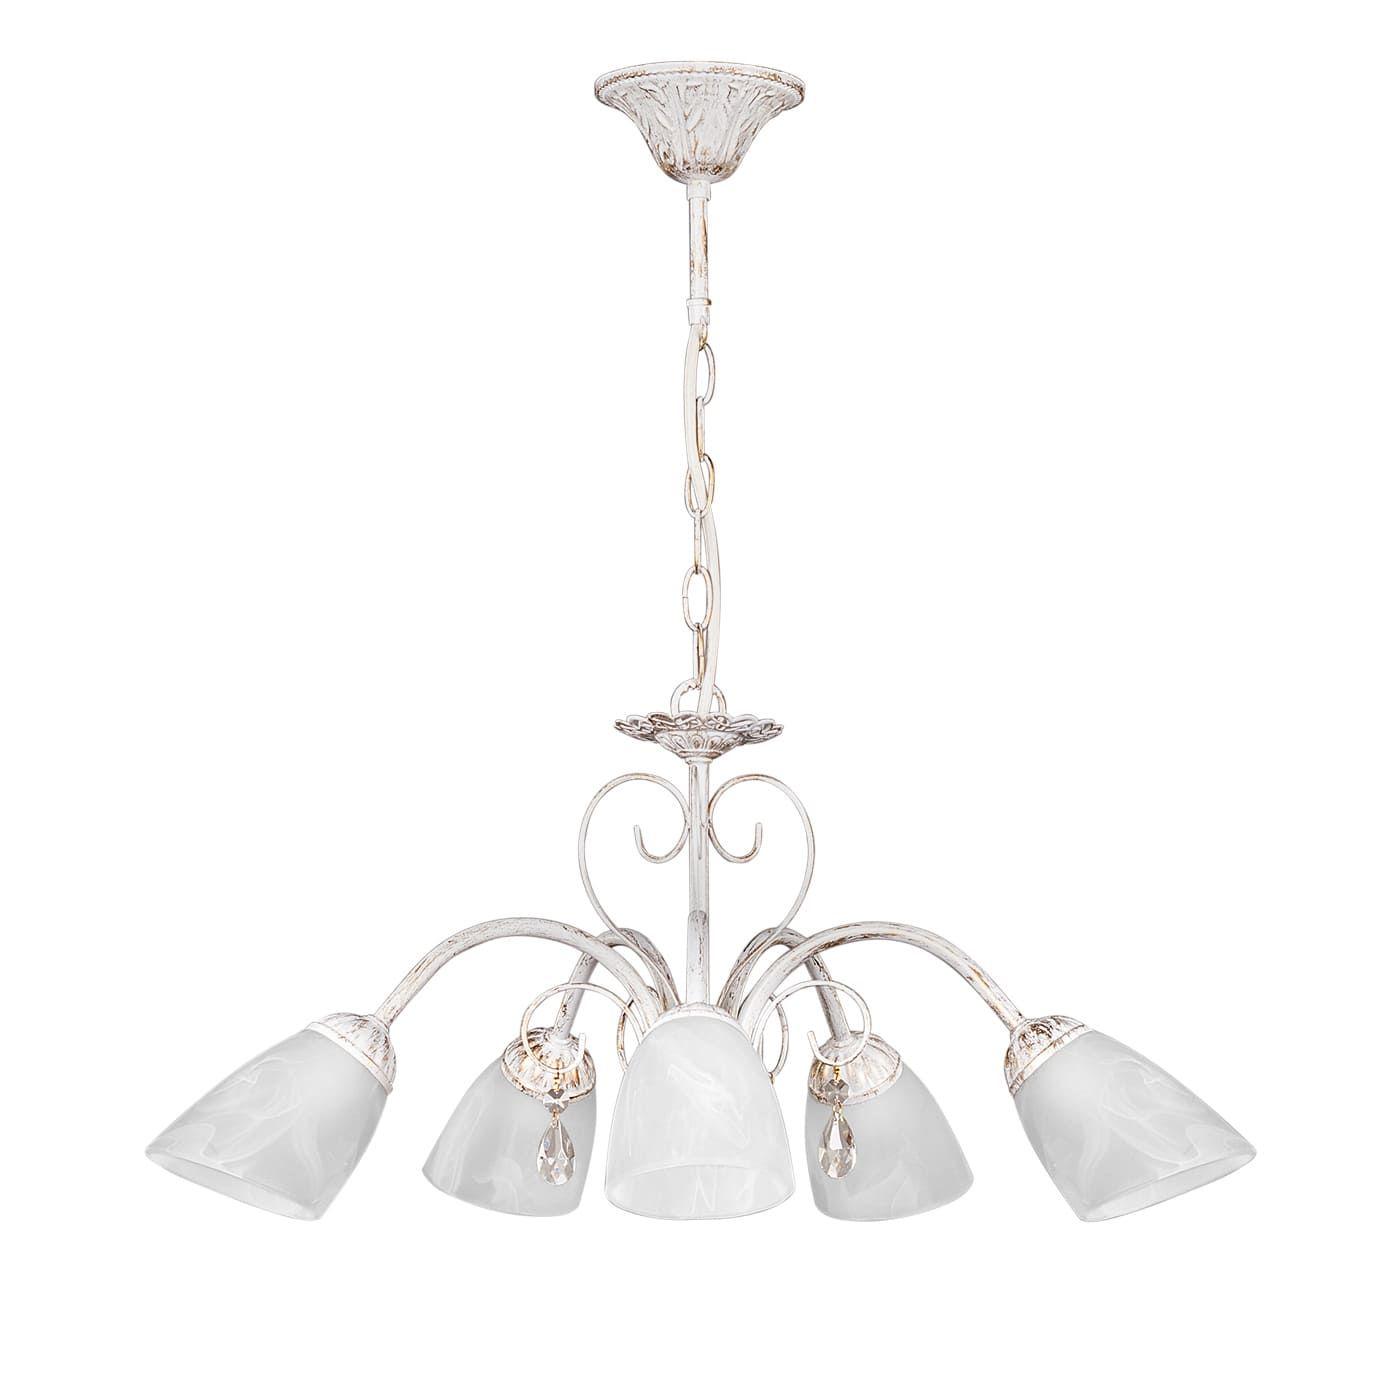 PETRASVET / Pendant chandelier S2005-5, 5xE14 max. 60W